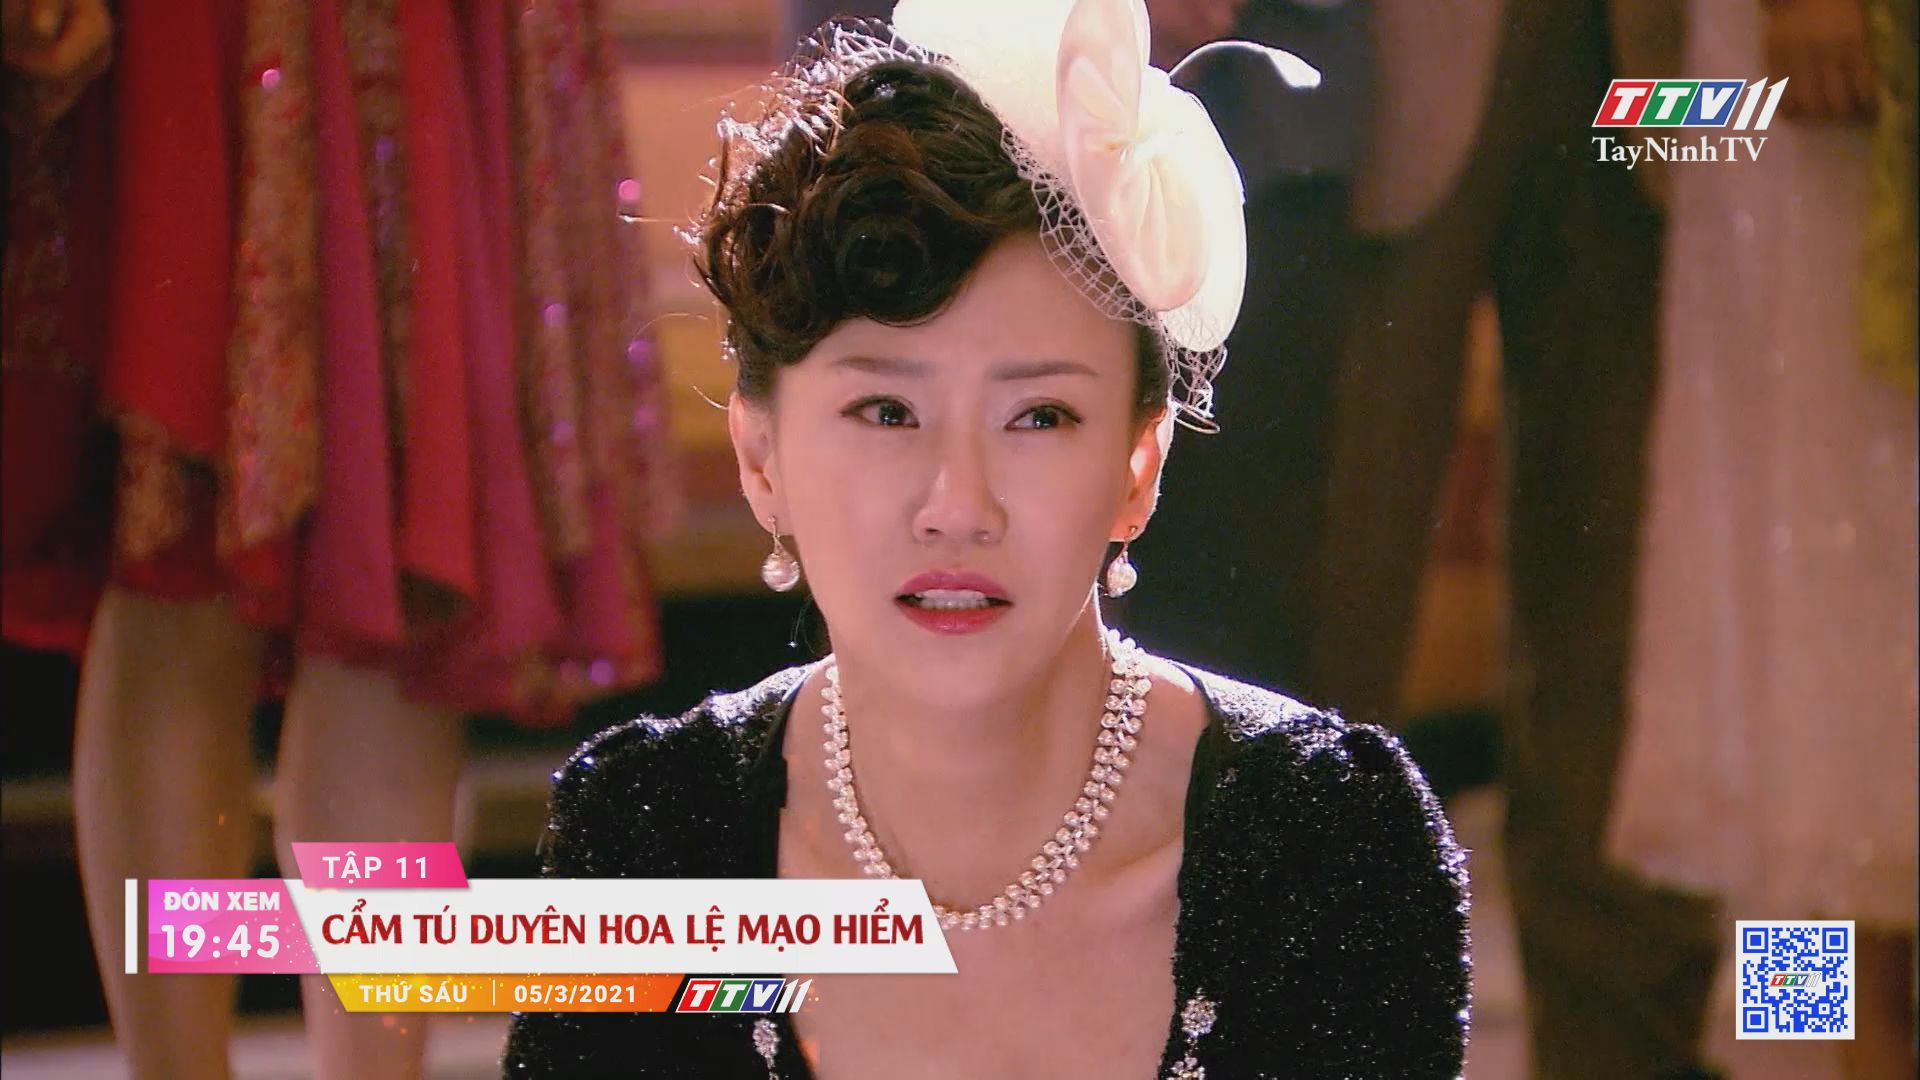 Cẩm Tú duyên hoa lệ mạo hiểm-Trailer tập 11 | PHIM CẨM TÚ DUYÊN HOA LỆ MẠO HIỂM | TayNinhTVE